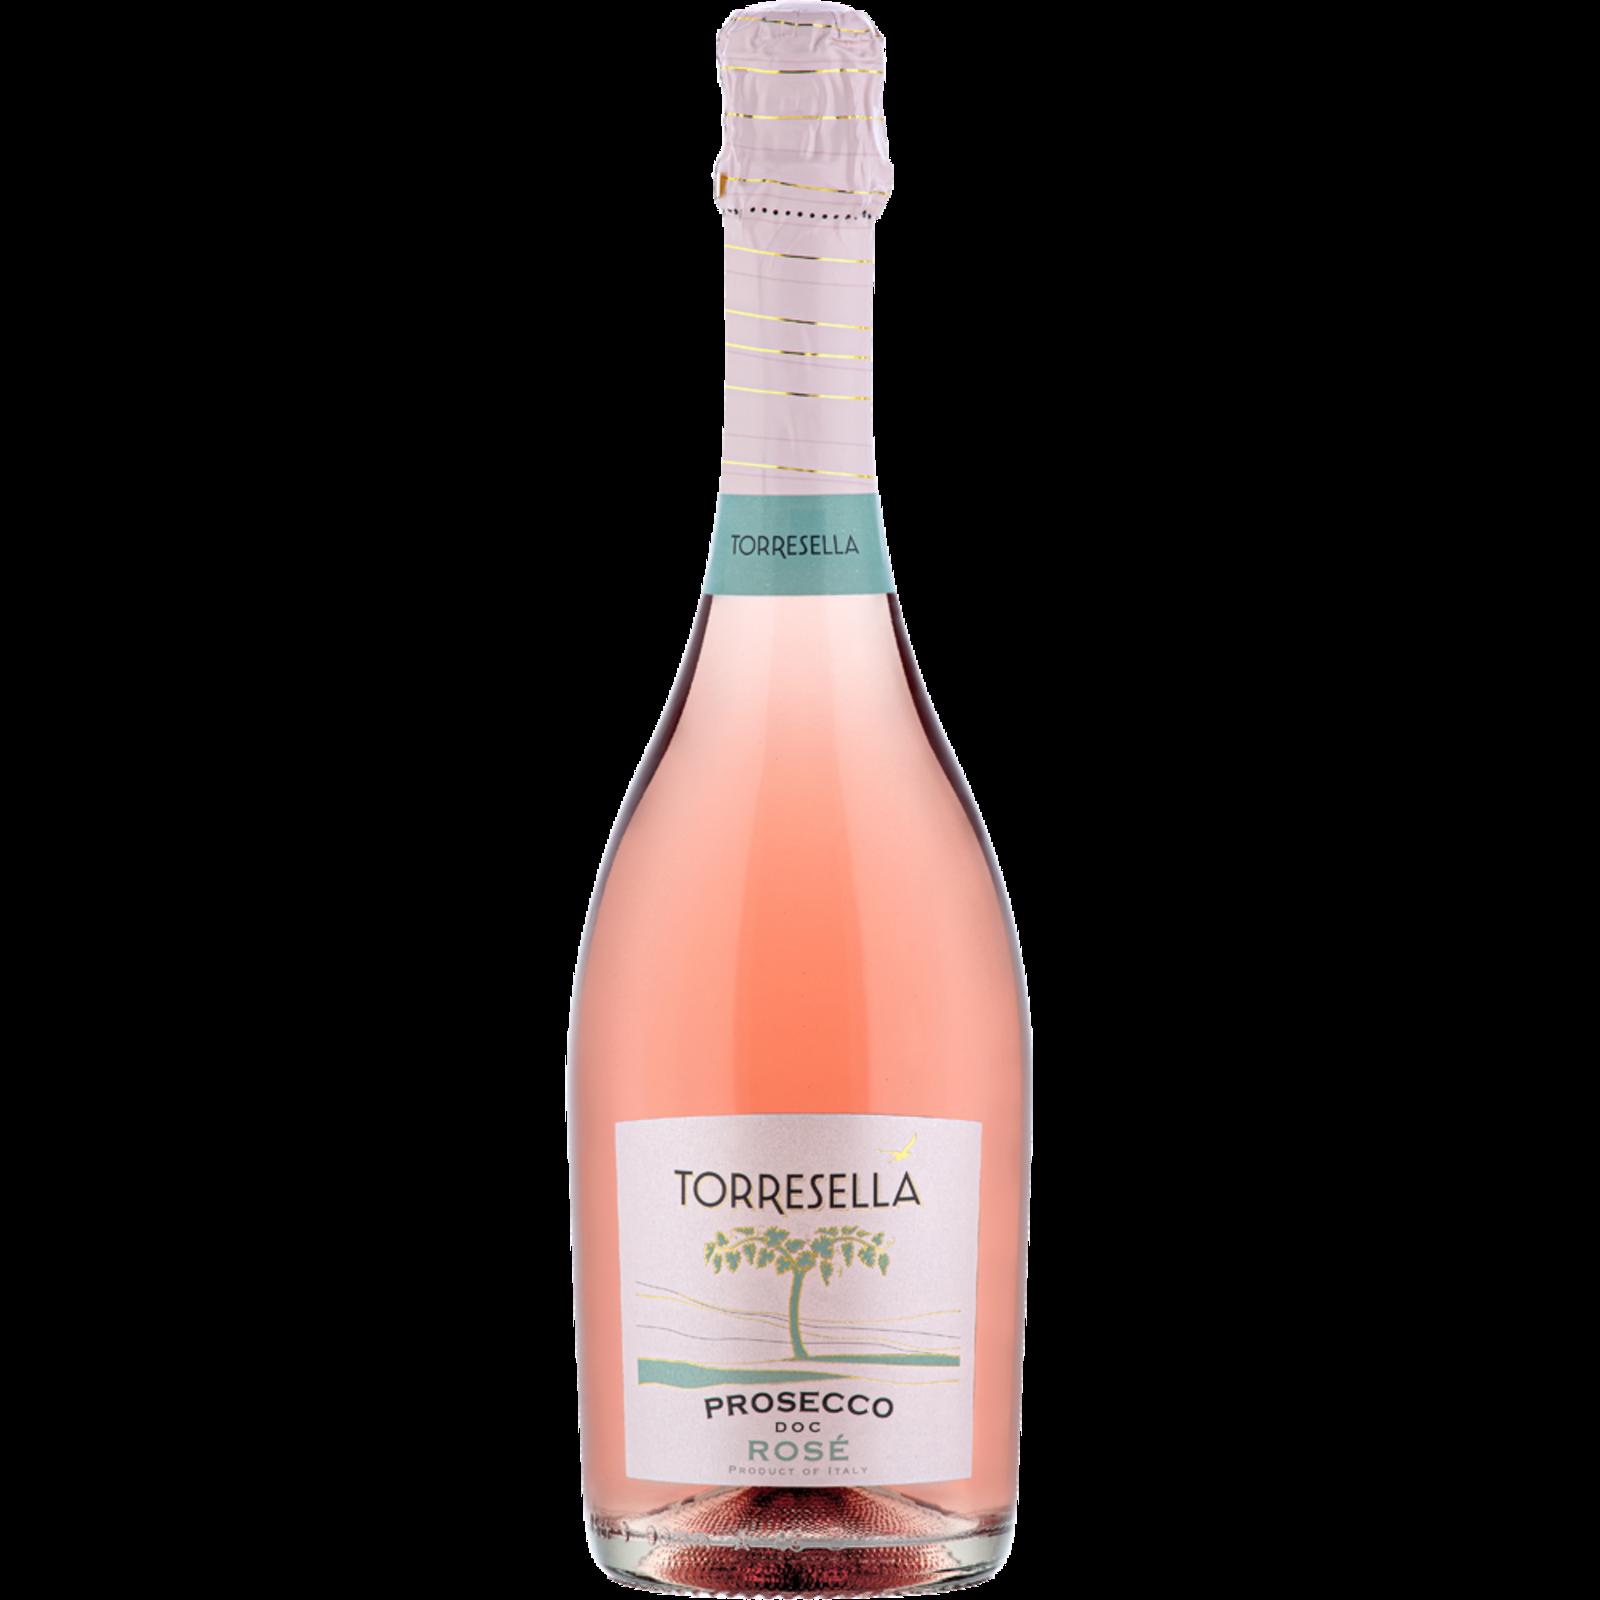 Cantine Torresella Torresella Prosecco Rose Brut 2020